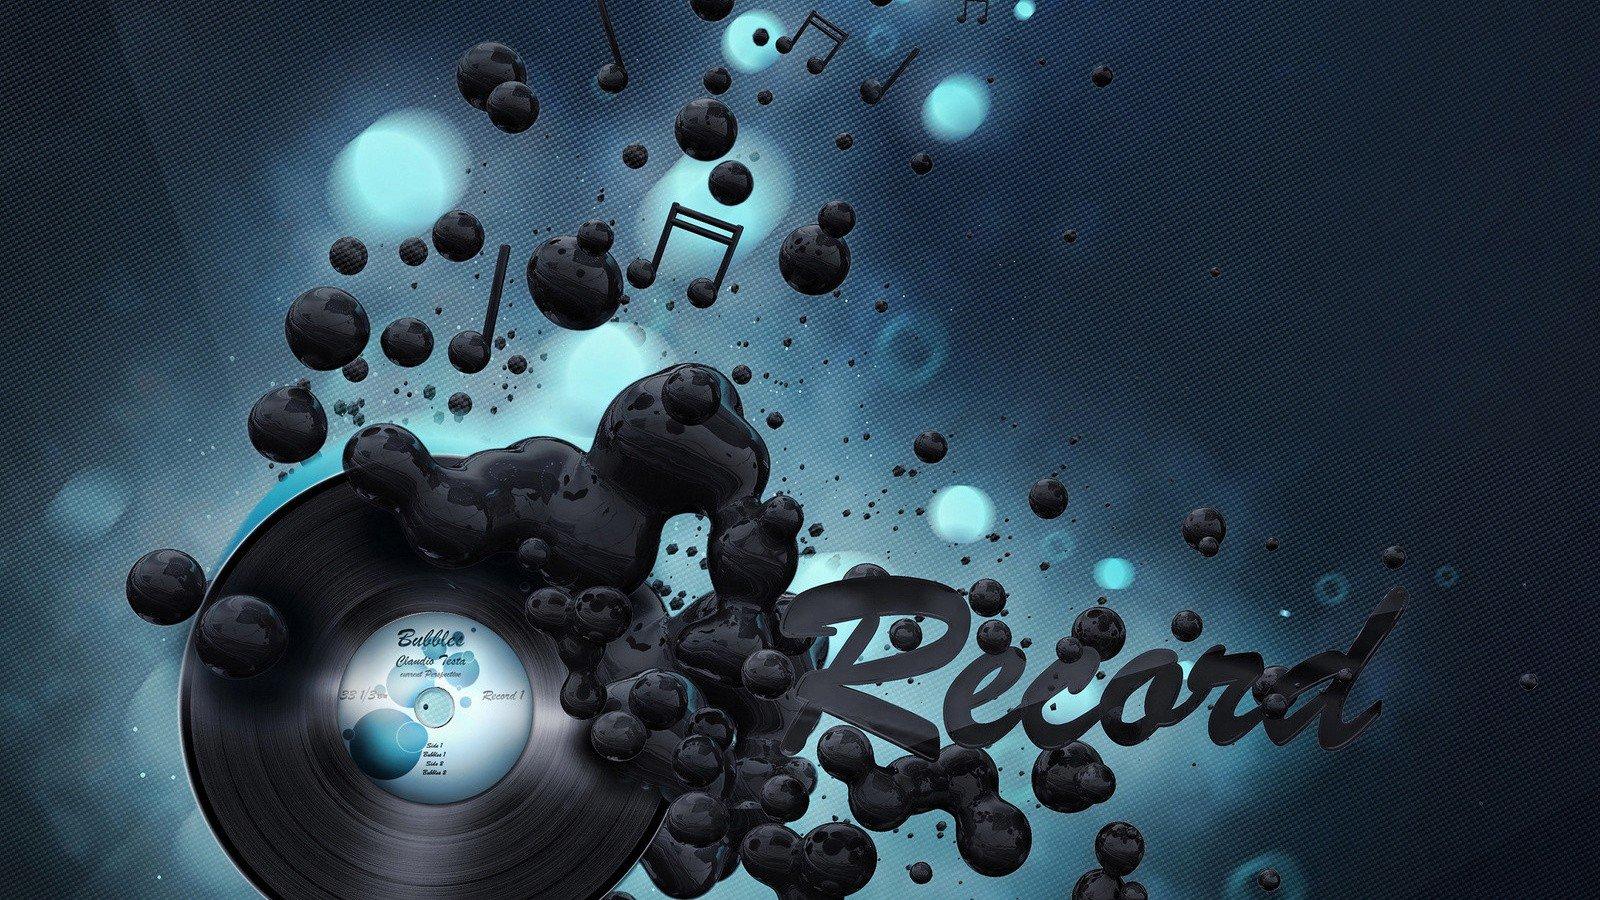 Abstract music record vinyl sound digital art wallpaper 1600x900 1600x900